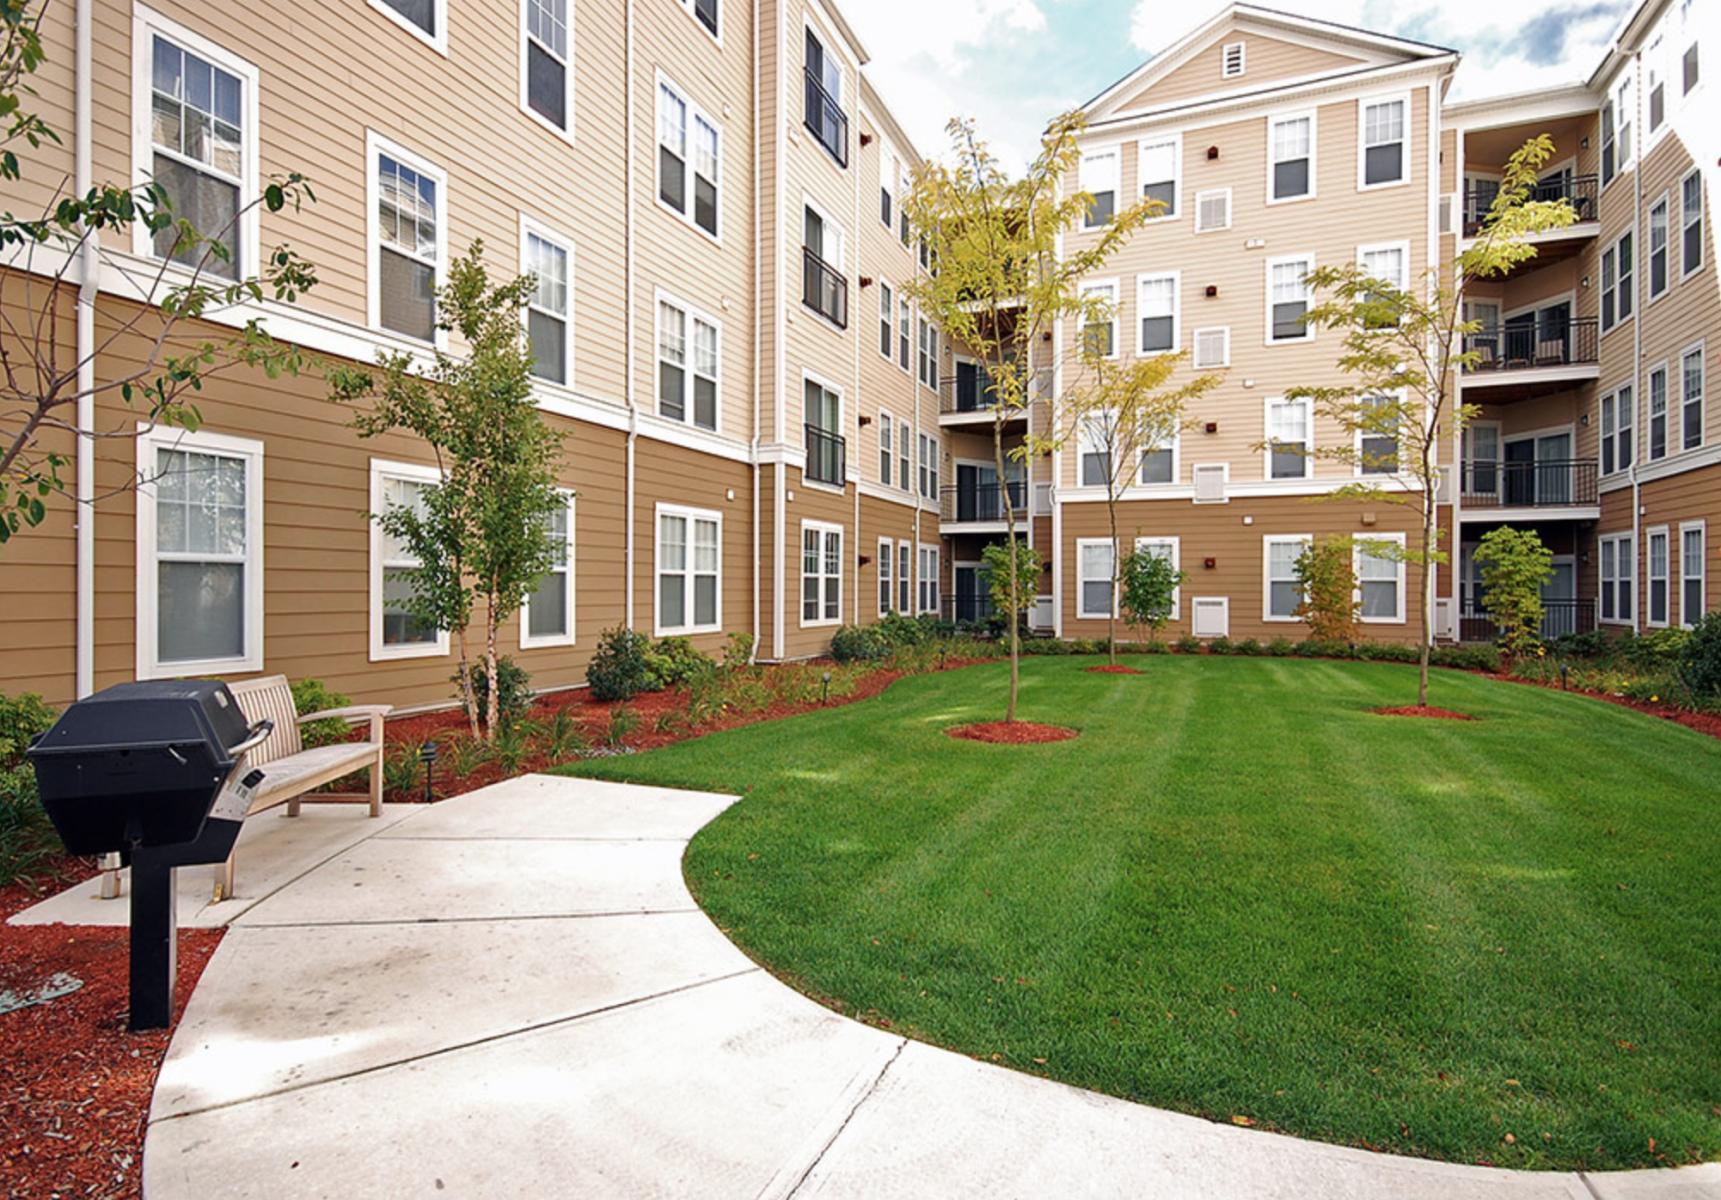 6 - Courtyard Area